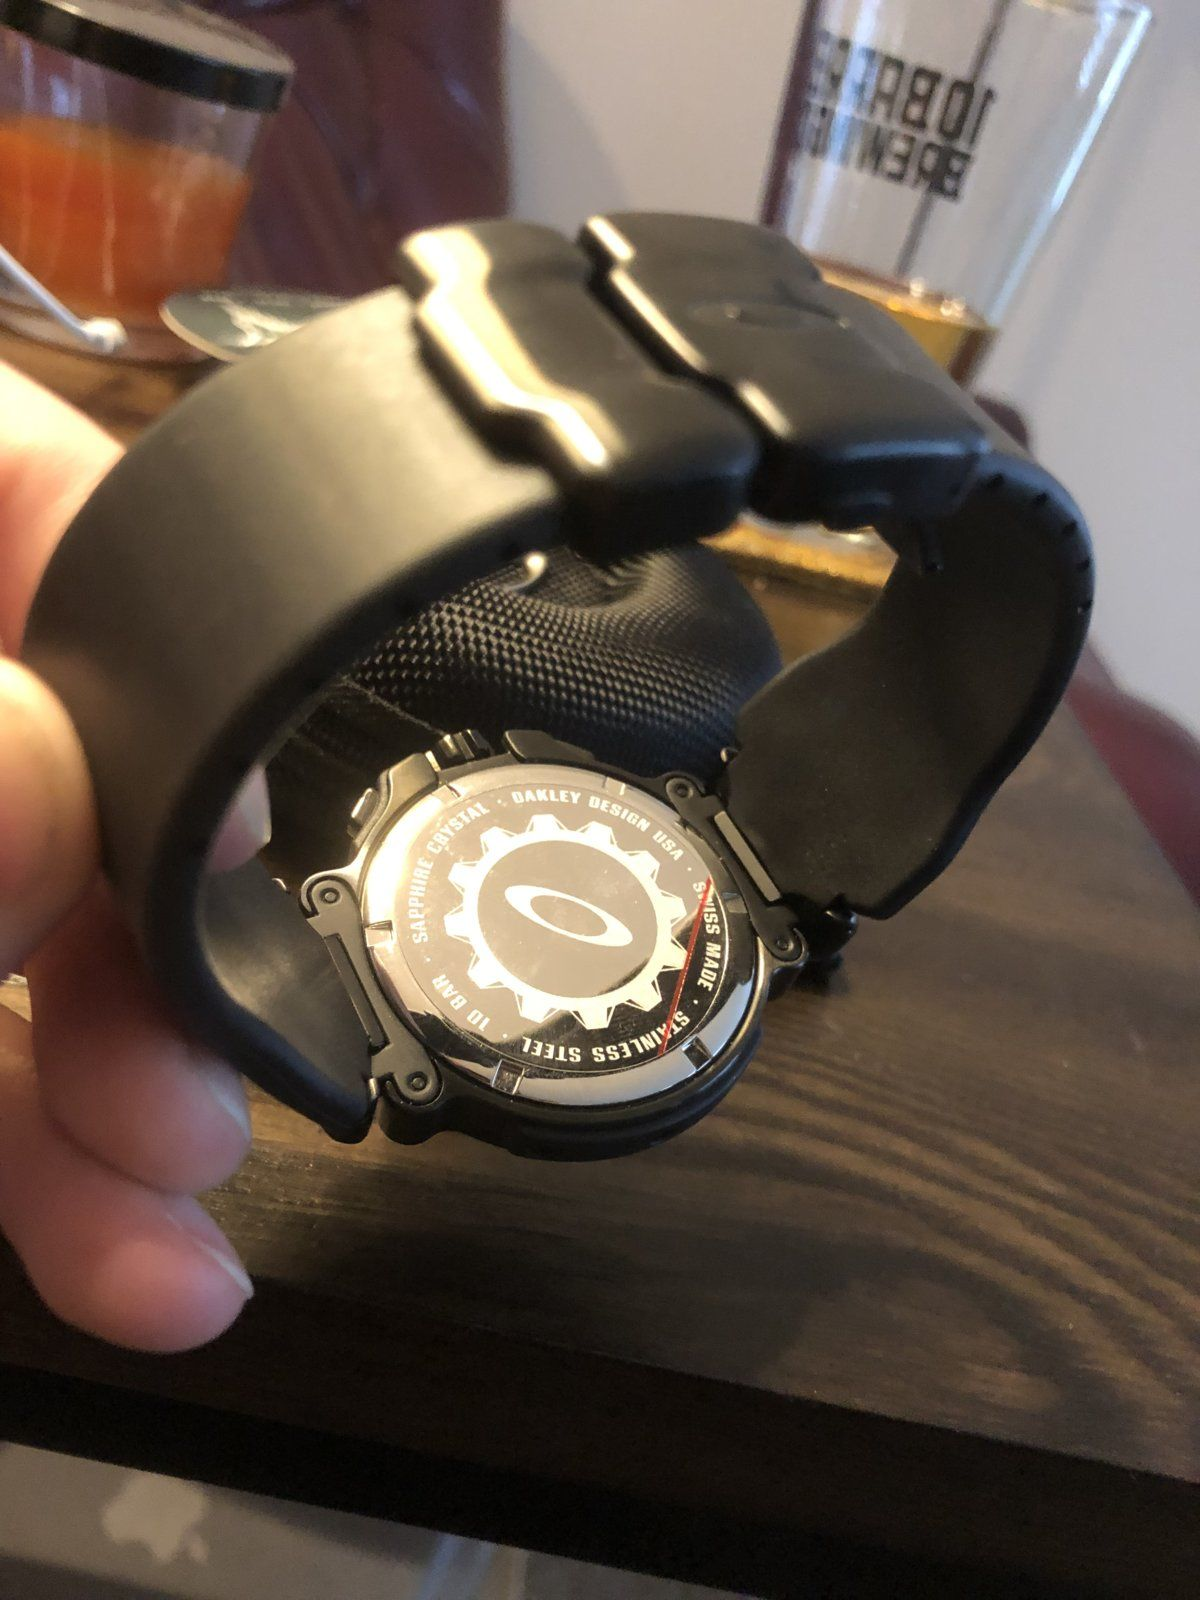 First Oakley Watch - 3BFB335A-3C0B-40D5-8FB9-481BF66ACD0E.jpeg